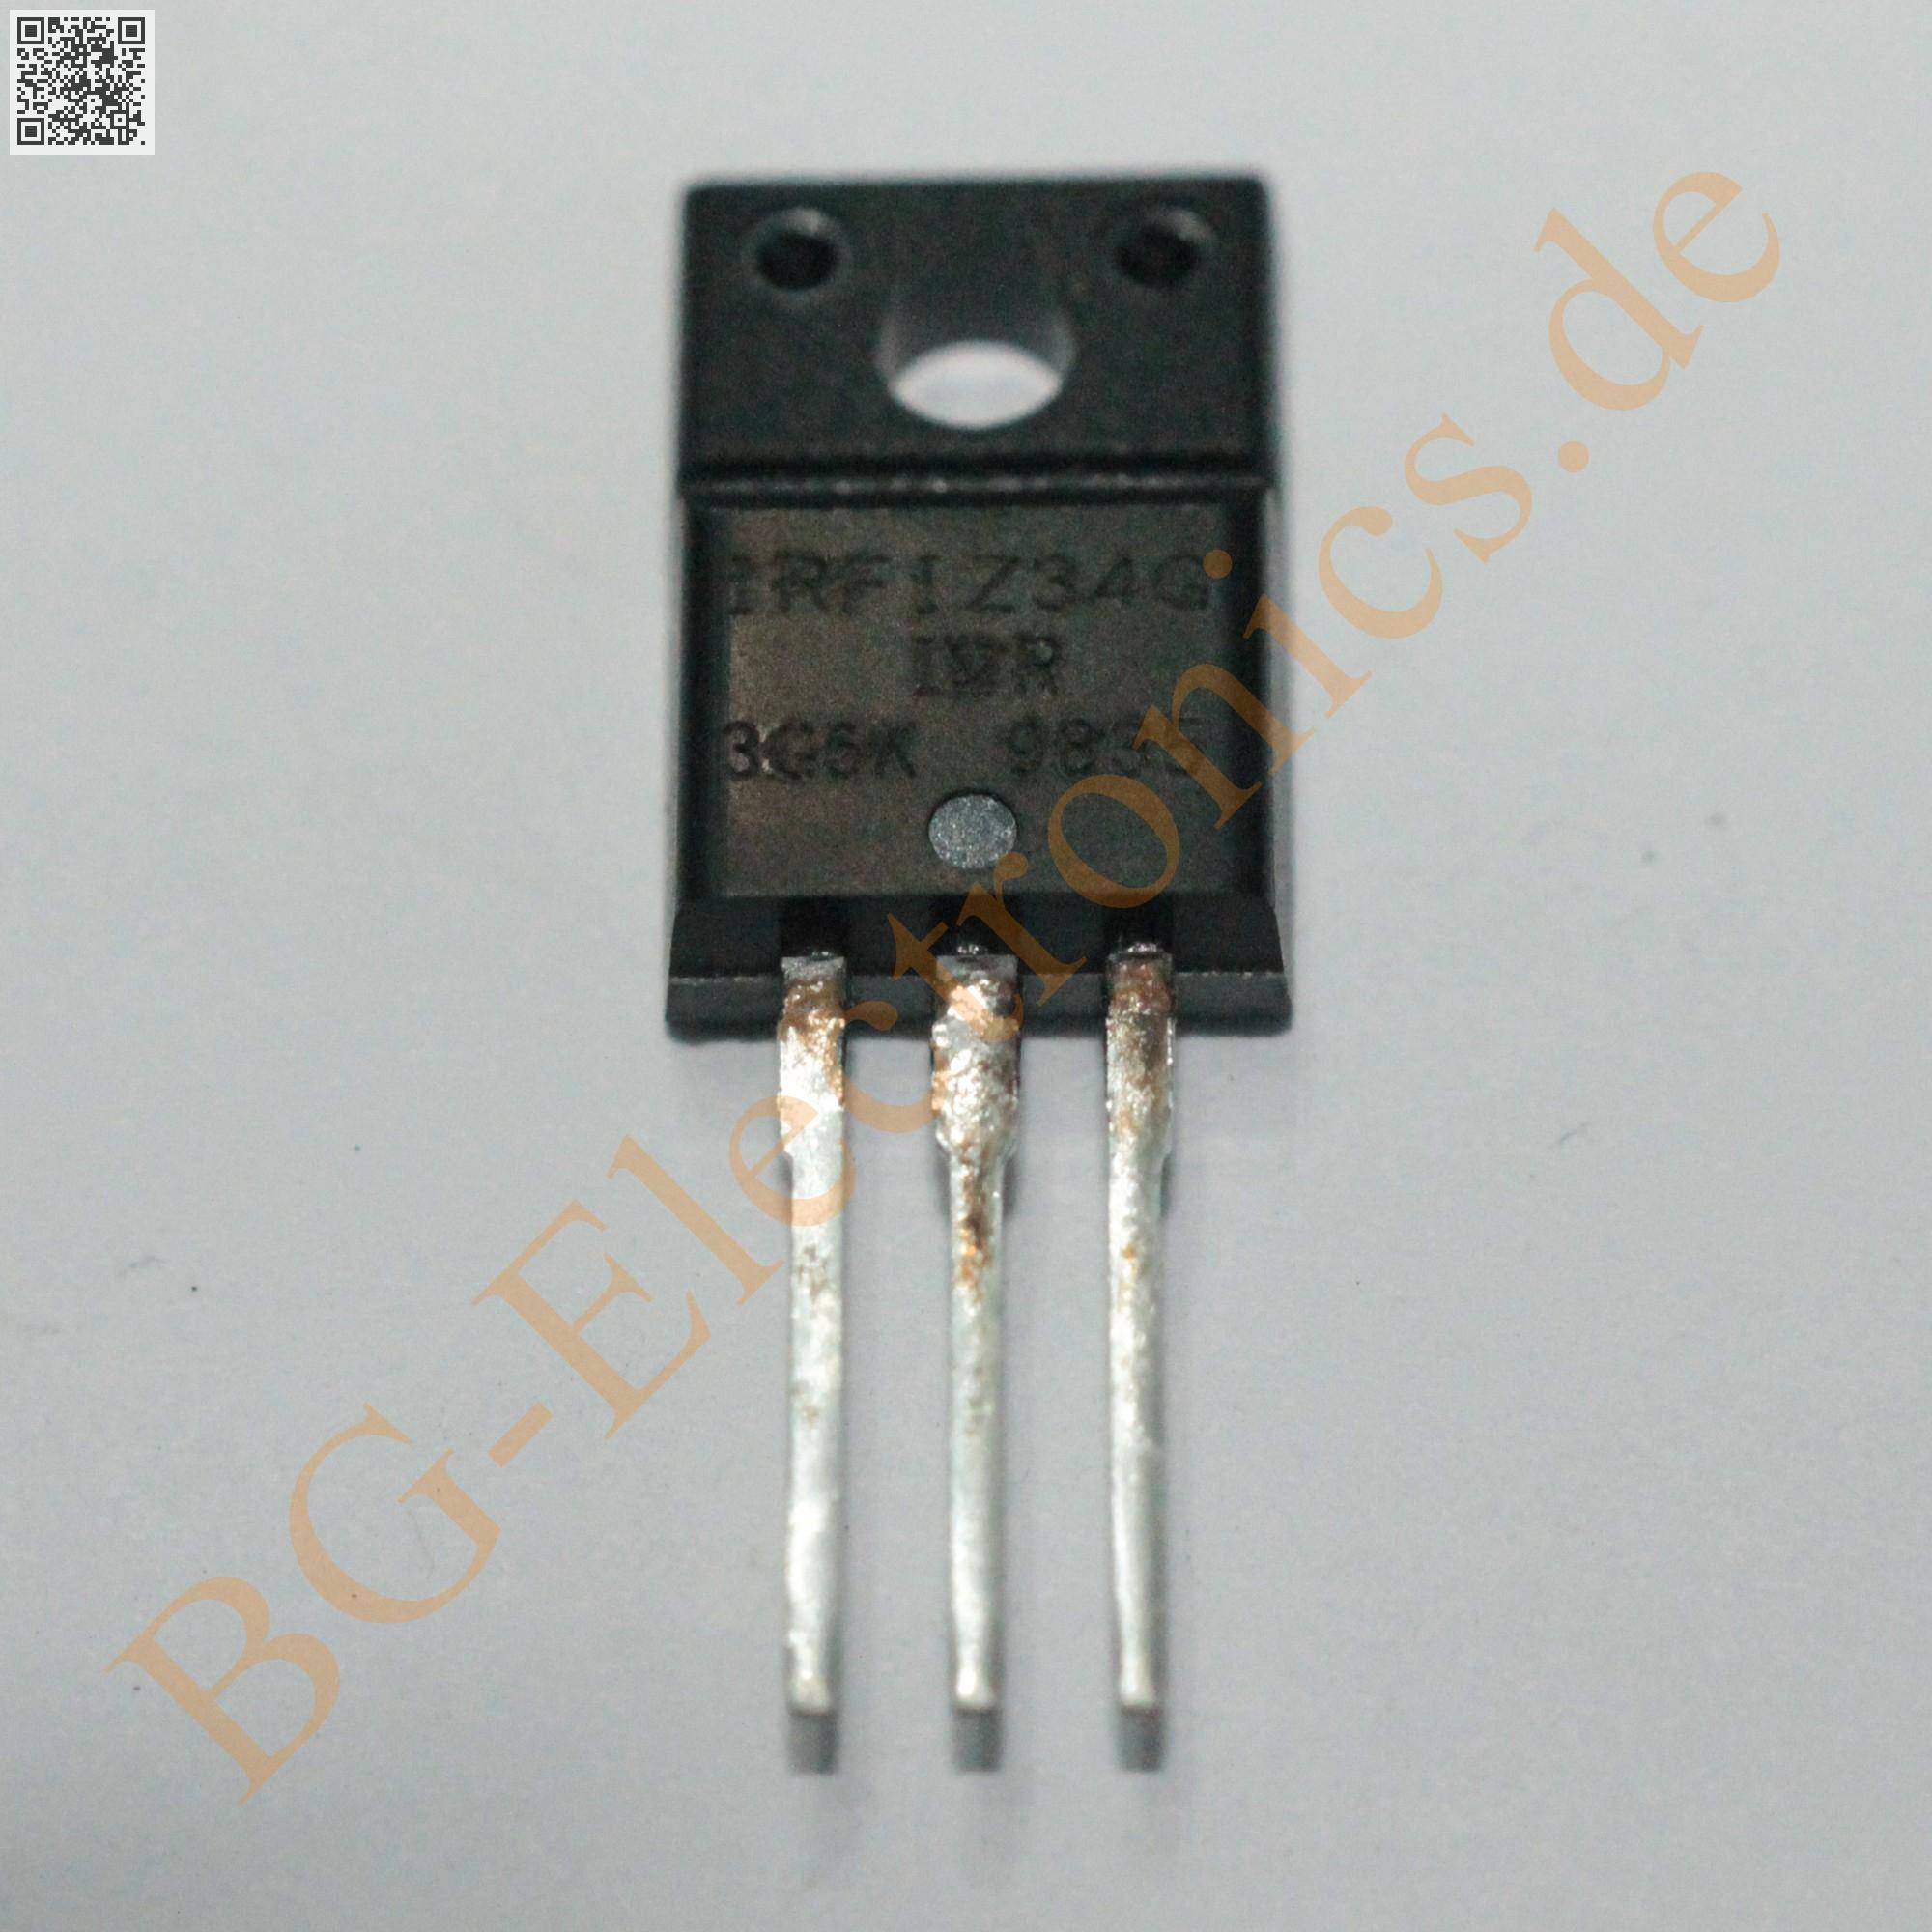 Lautsprecherkabel 2x1,5 mm² transparent, BG-ELECTRONICS ...